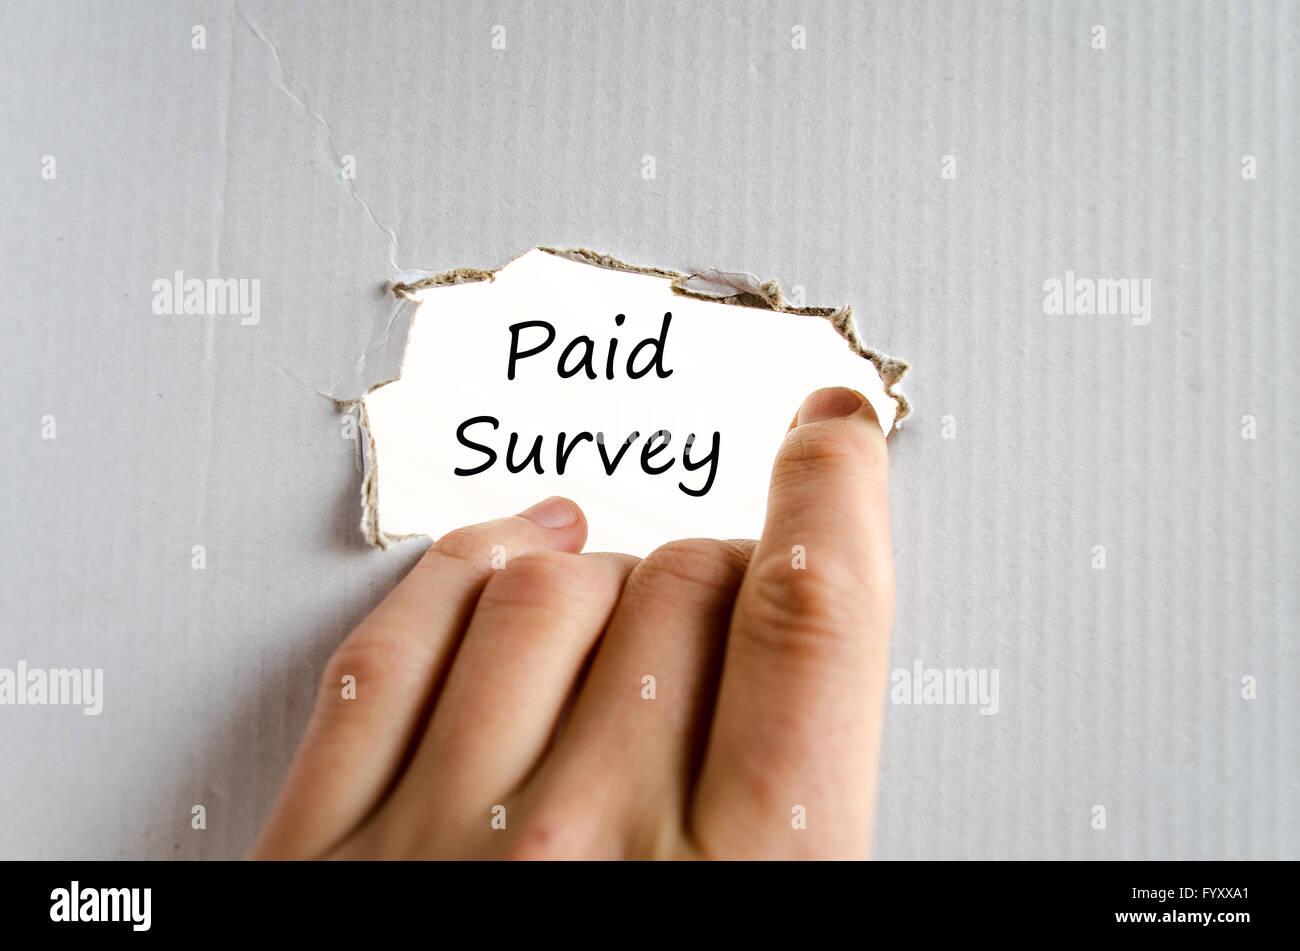 Paid survey text concept - Stock Image